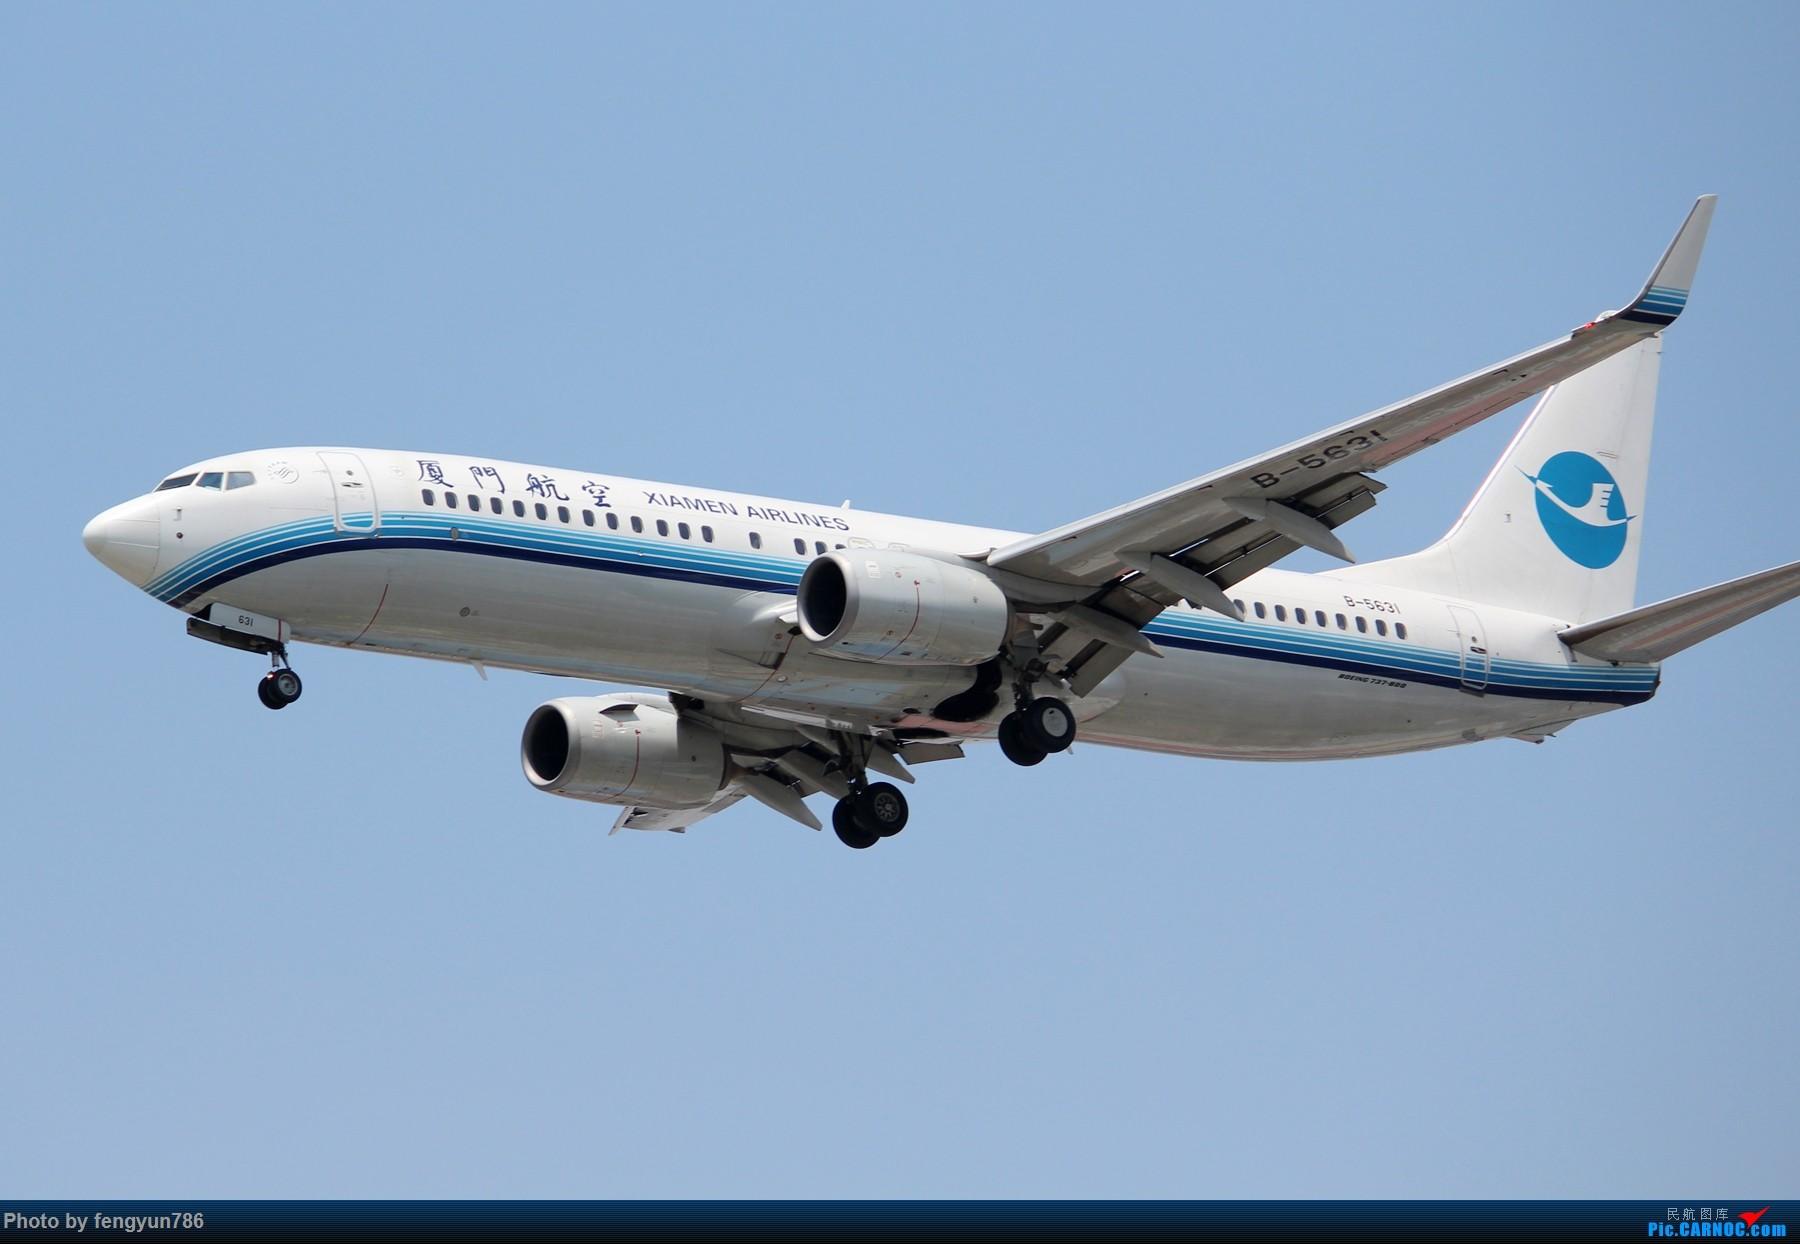 Re:[原创]7.19的SHA,天晴温高,发几个跟前一天不一样的。 BOEING 737-800 B-5631 中国上海虹桥国际机场